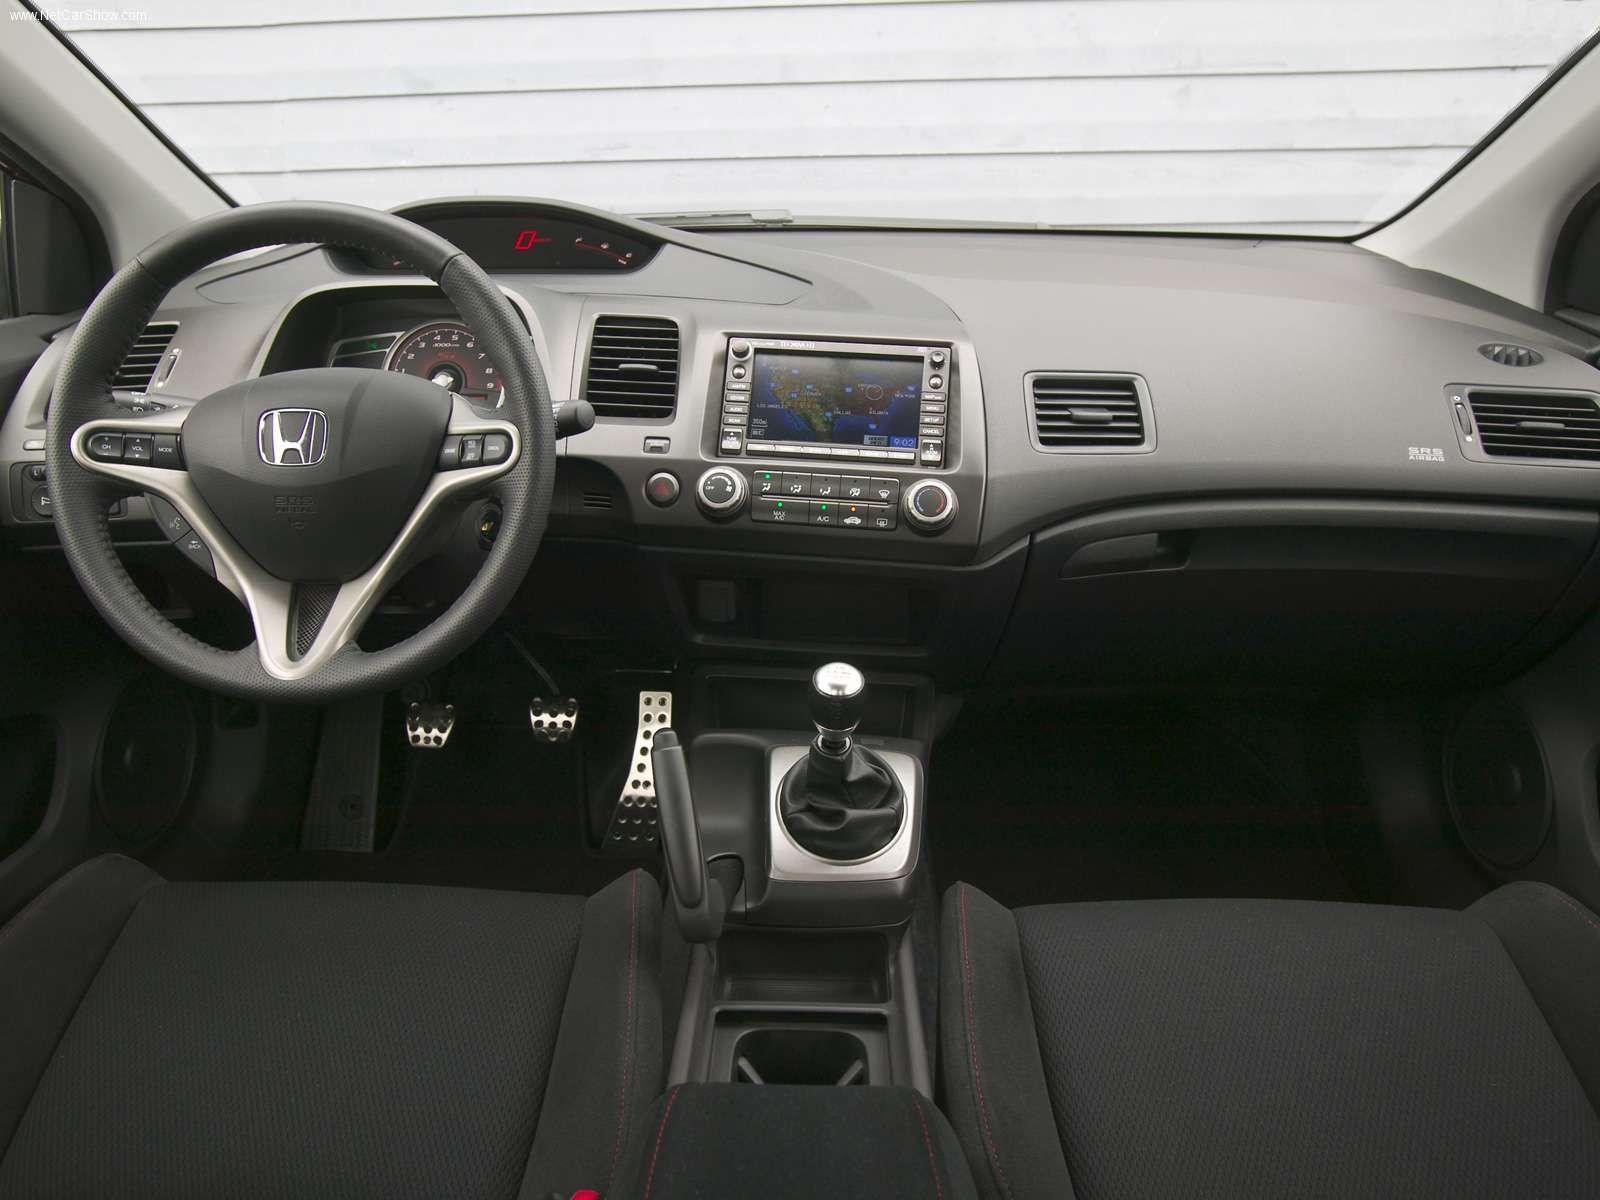 Honda Civic Si 2006 Carros Auto